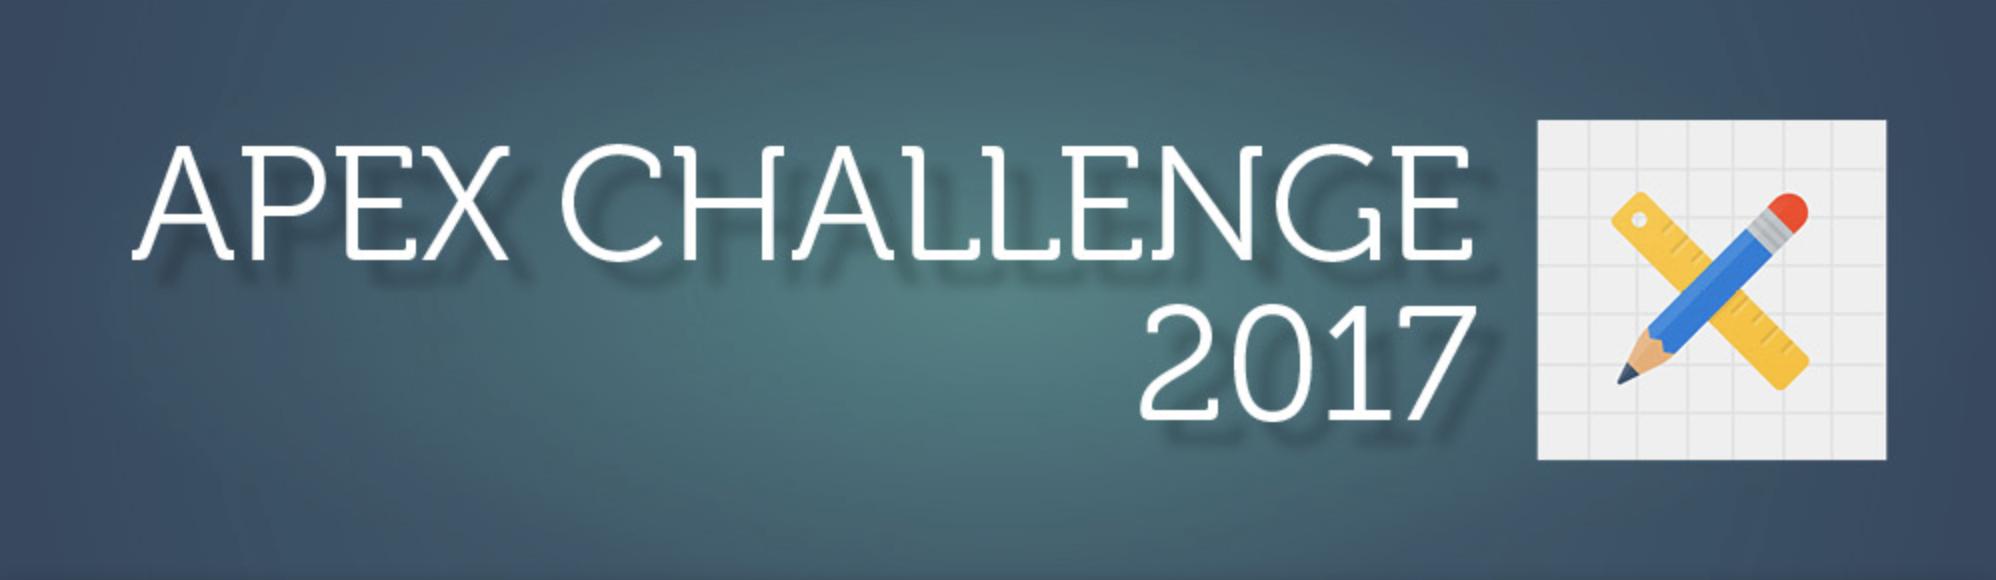 APEX Challenge